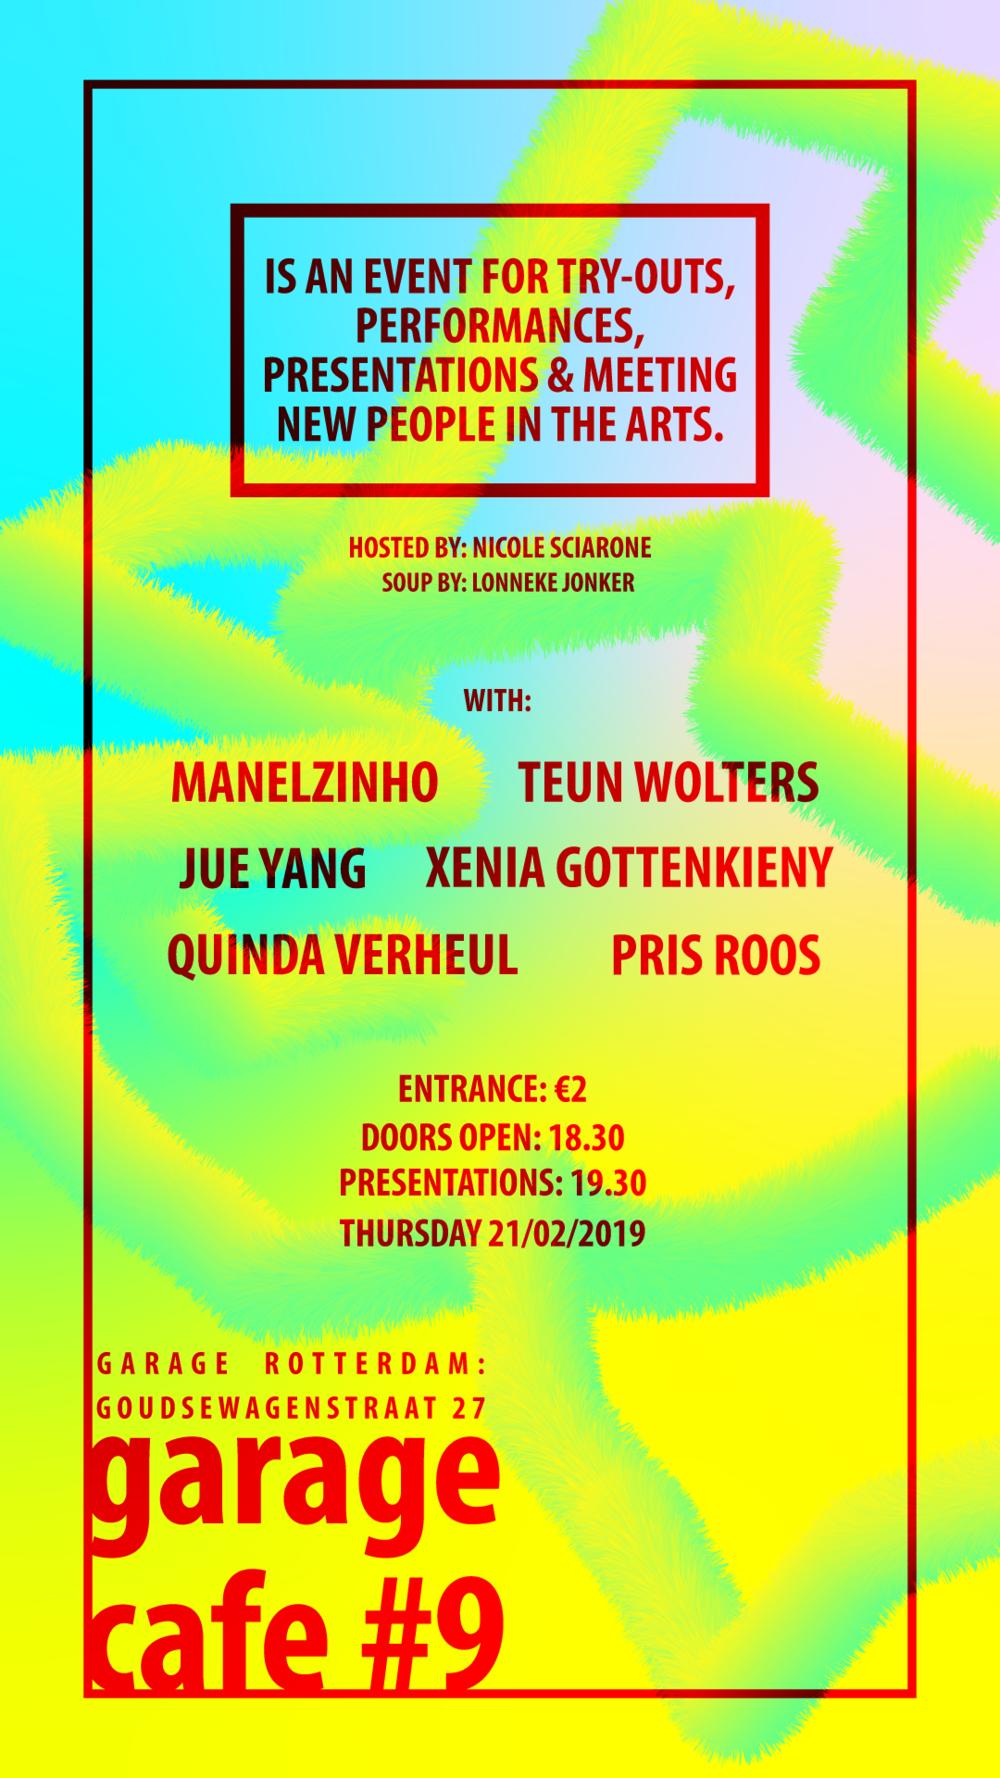 Garage-Rotterdam-9-Speaker-announcement-poster-IGStories.png